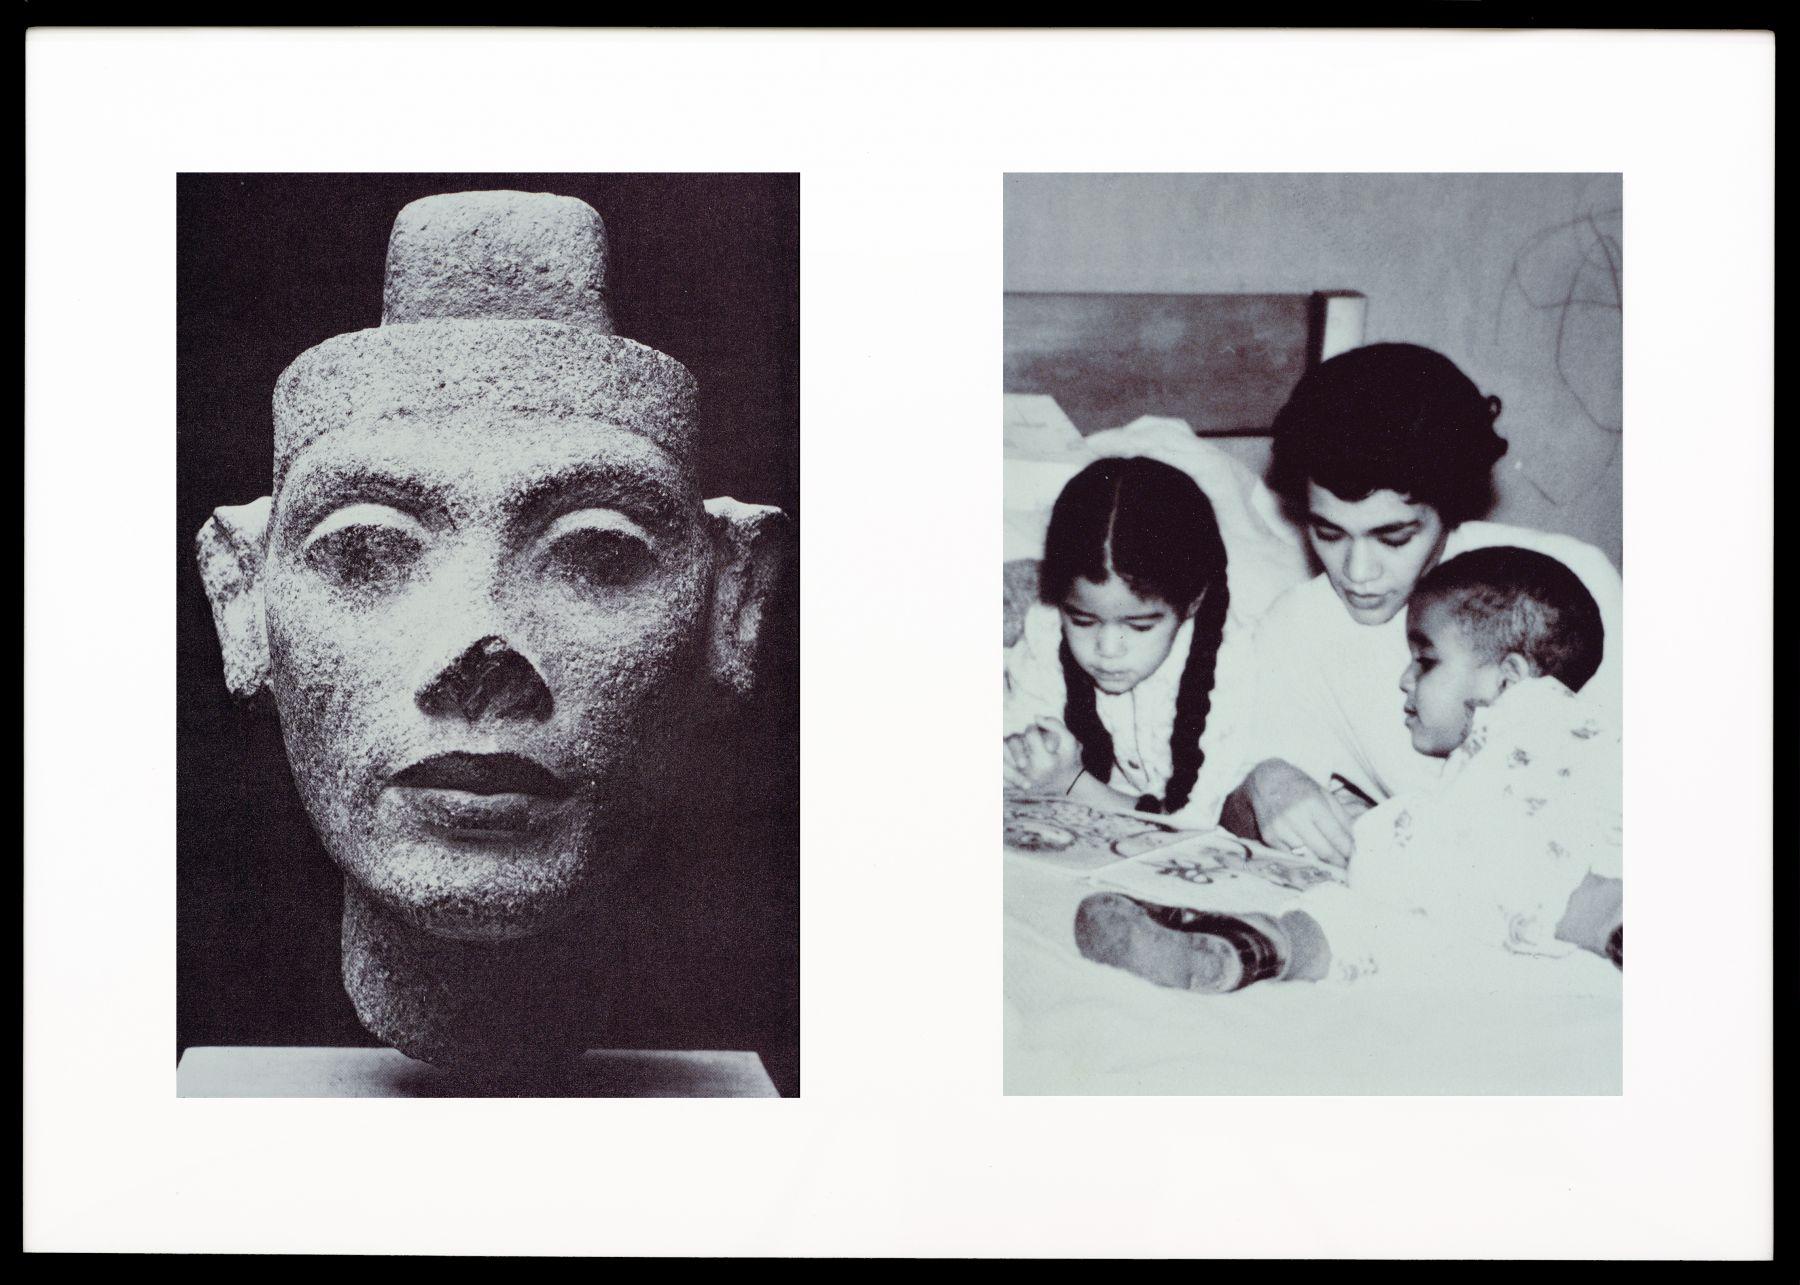 Lorraine O'Grady, Miscegenated Family Album (Motherhood), L: Nefertiti; R: Devonia reading to Candace and Edward, Jr., 1980/1994